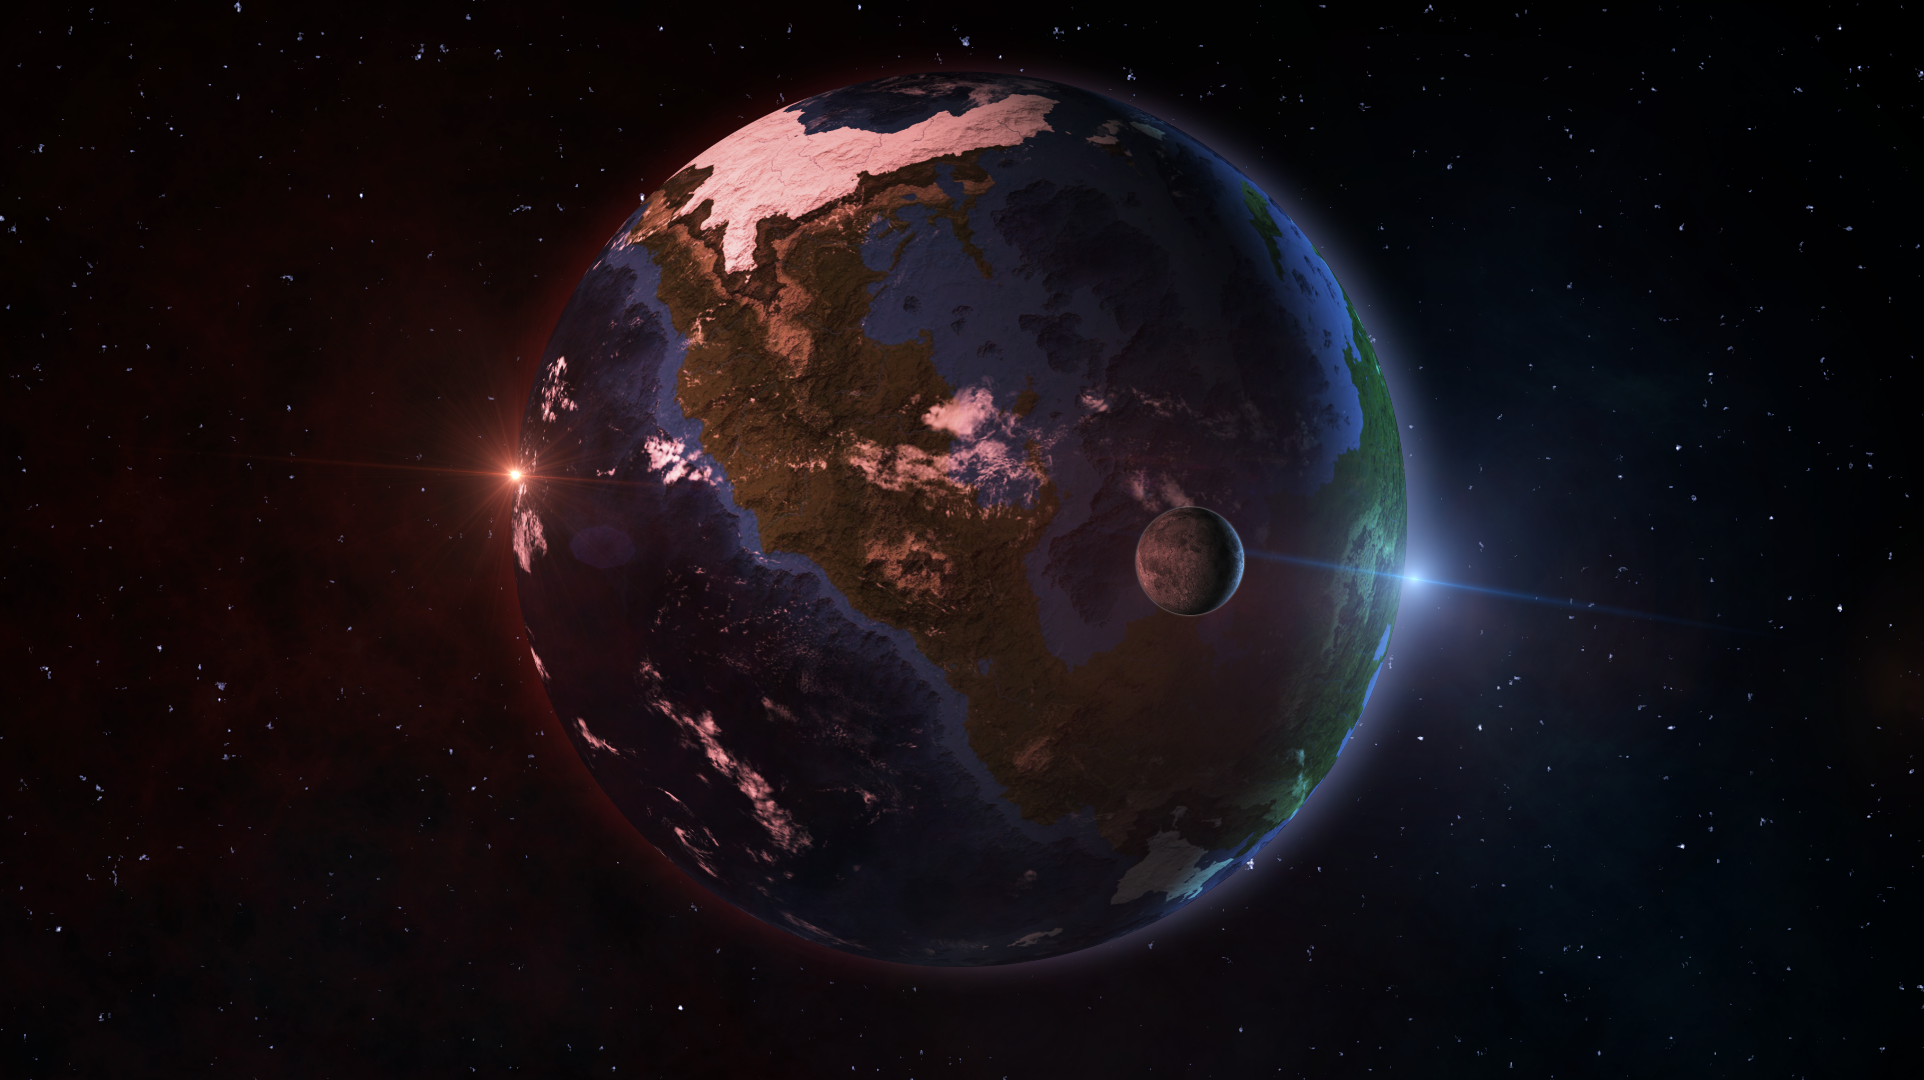 project universe alien planet by archange1michael on